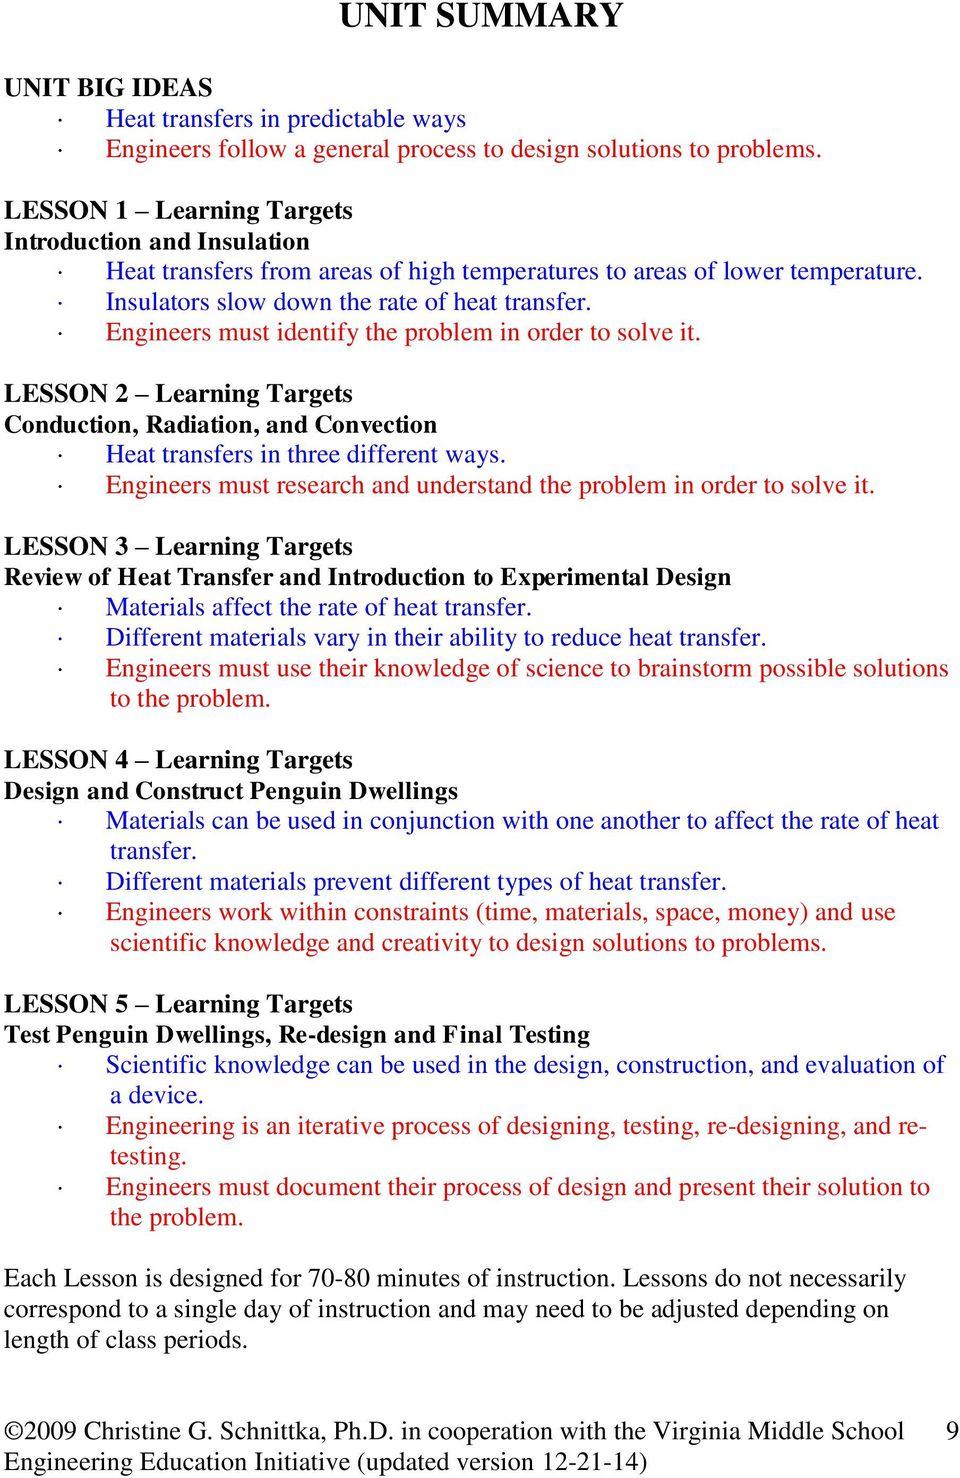 hight resolution of Heat Transfer Worksheet Middle School - Nidecmege